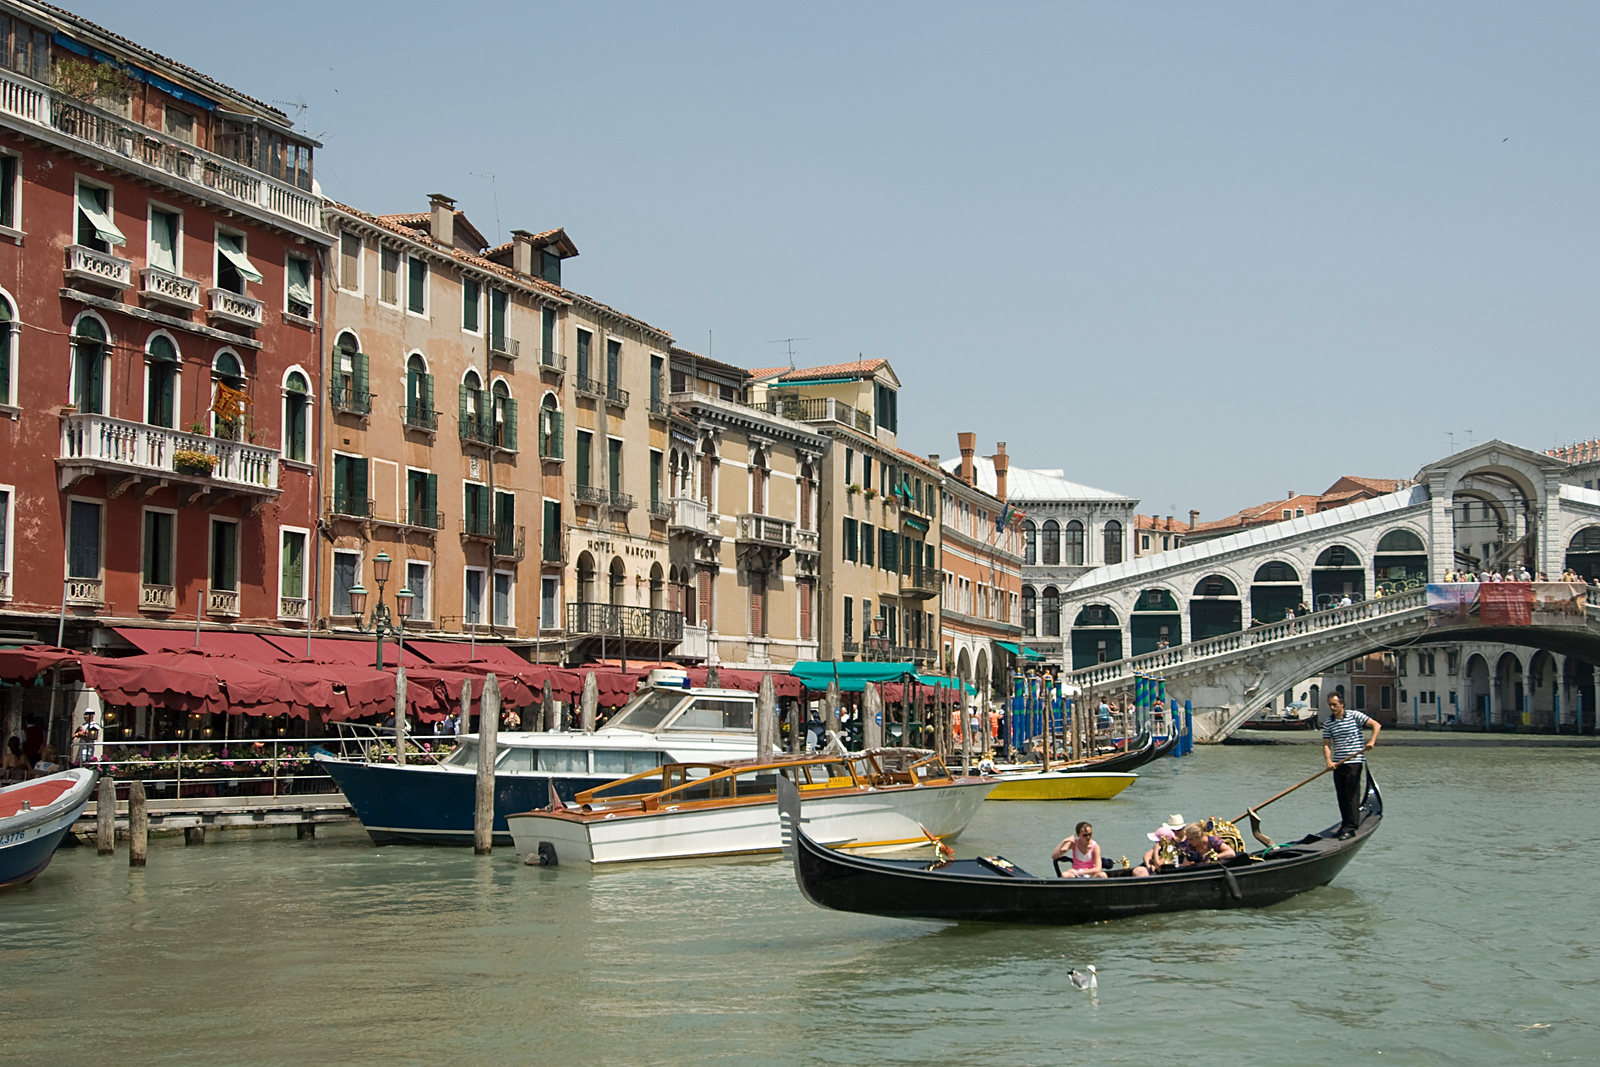 Tourists riding the gondola near Rialto Bridge in Venice, Italy